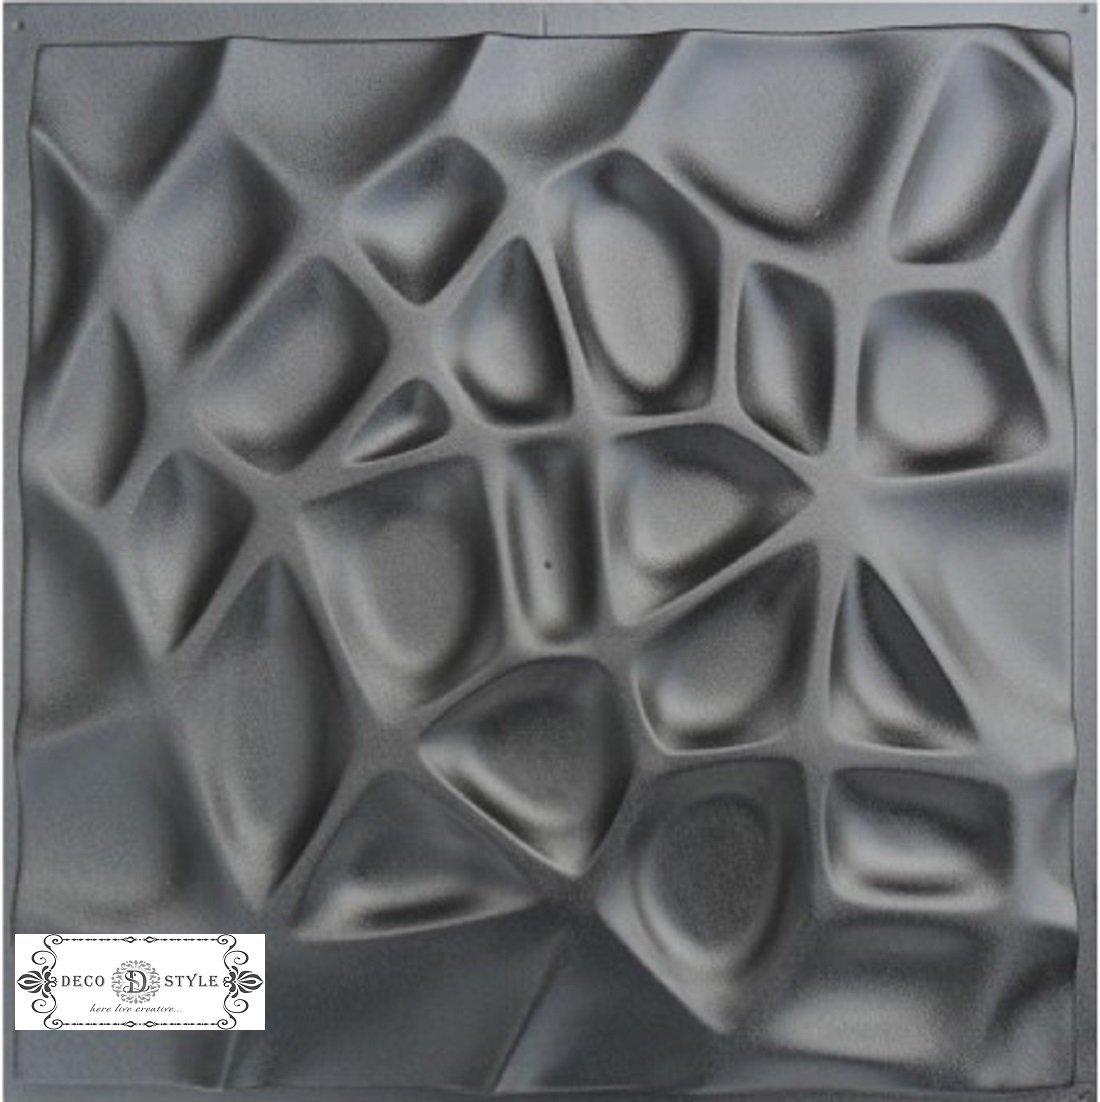 Spiderweb Plastic Molds For 3 D Panels Plaster Wall Stone Form 3D Decor Wall Panels Art Decor Decorative Wall Tile Panels